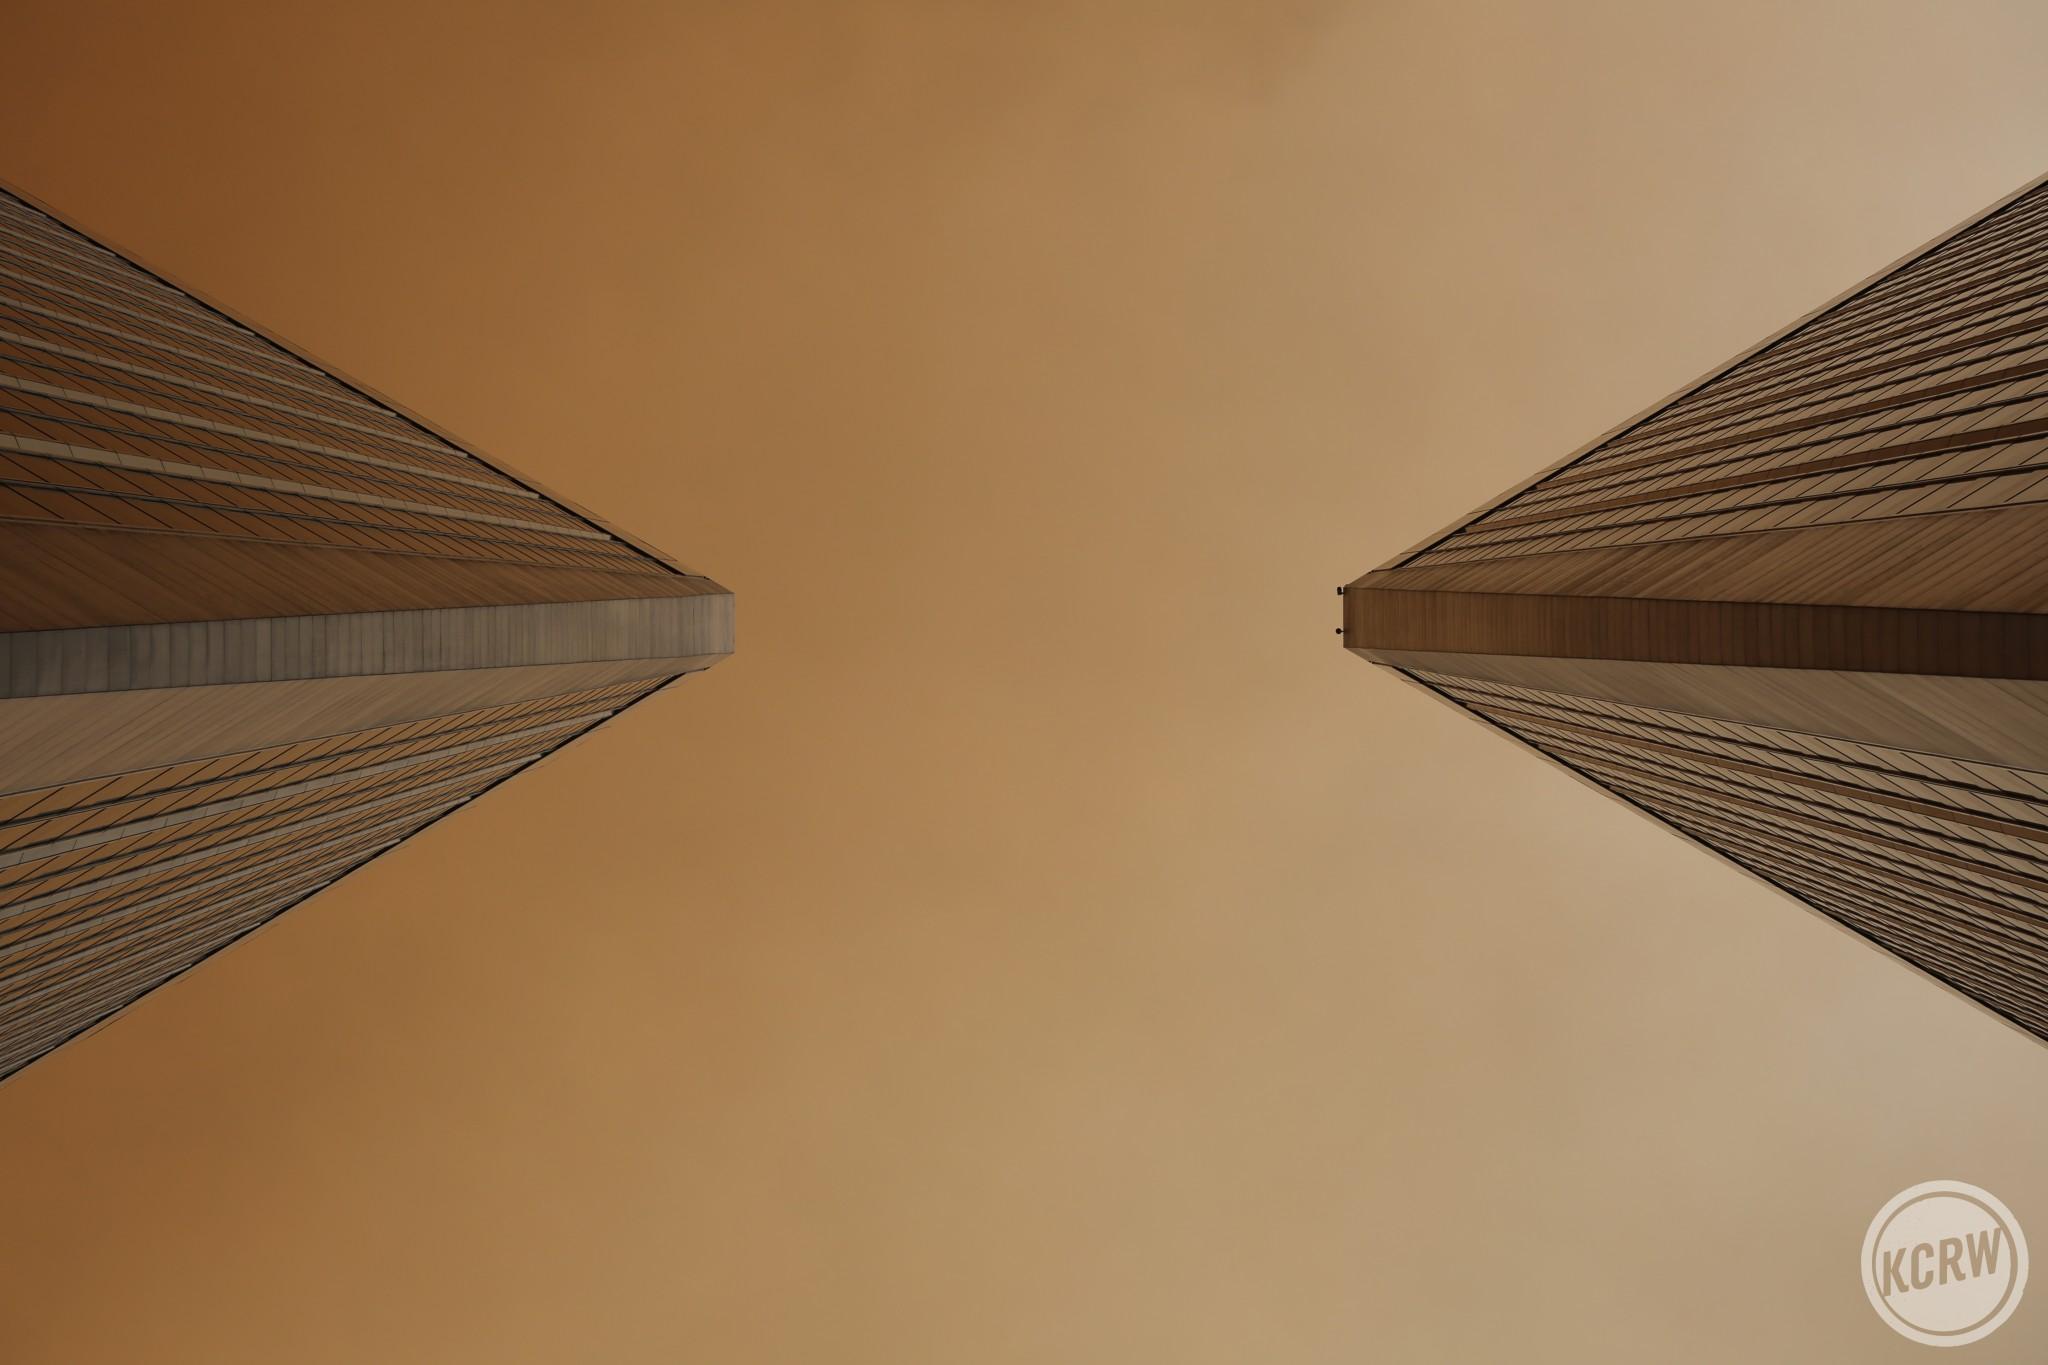 Century City Park's twin towers cutting through the smokey air.